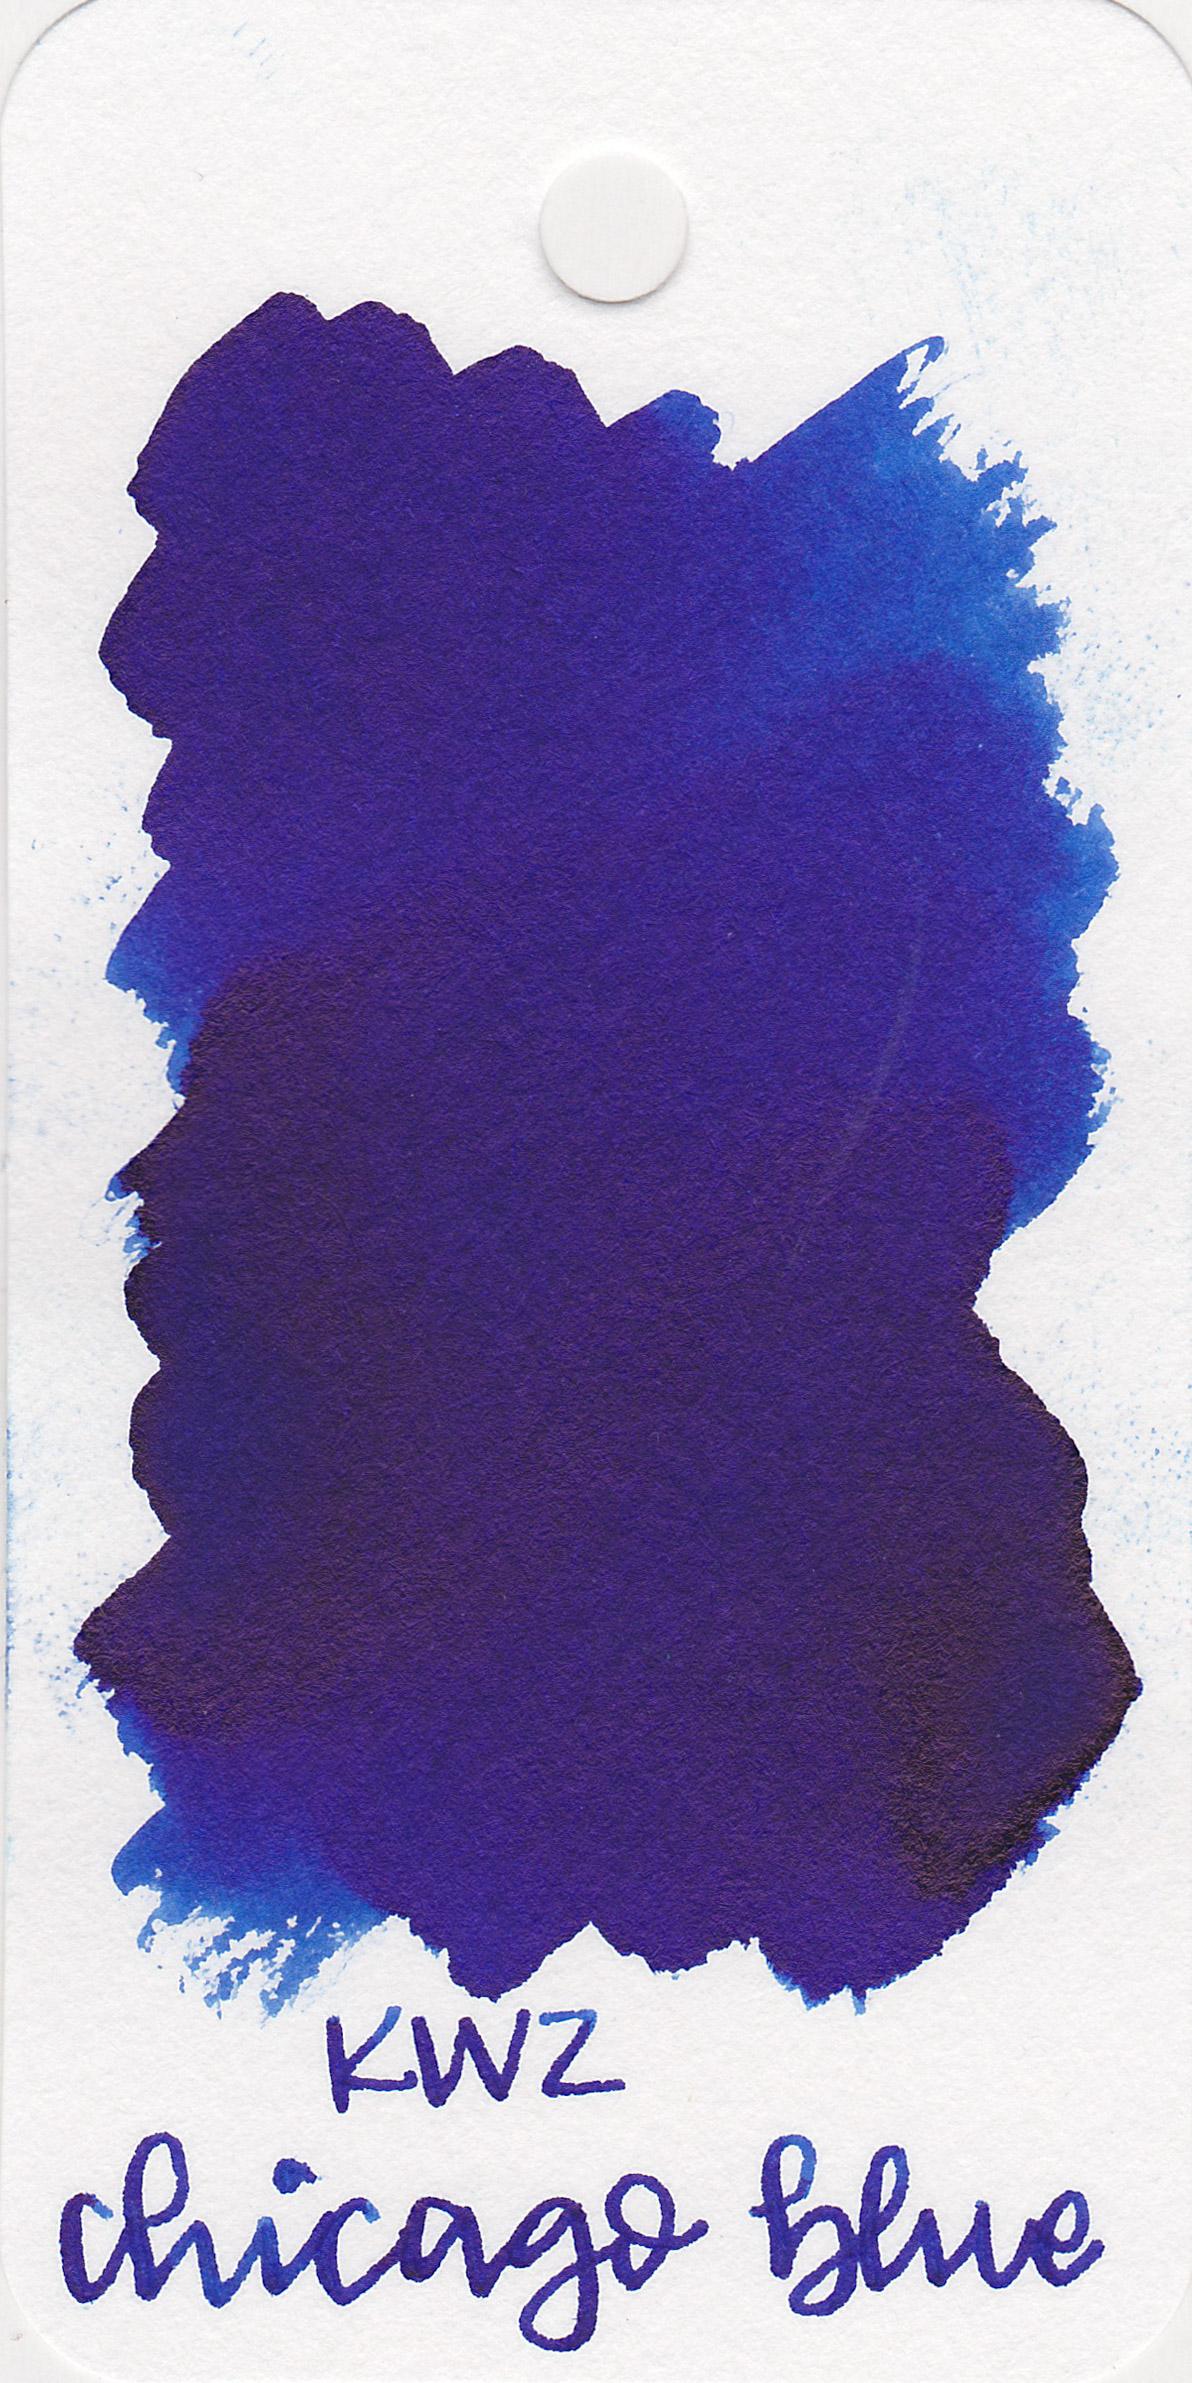 kwz-chicago-blue-1.jpg